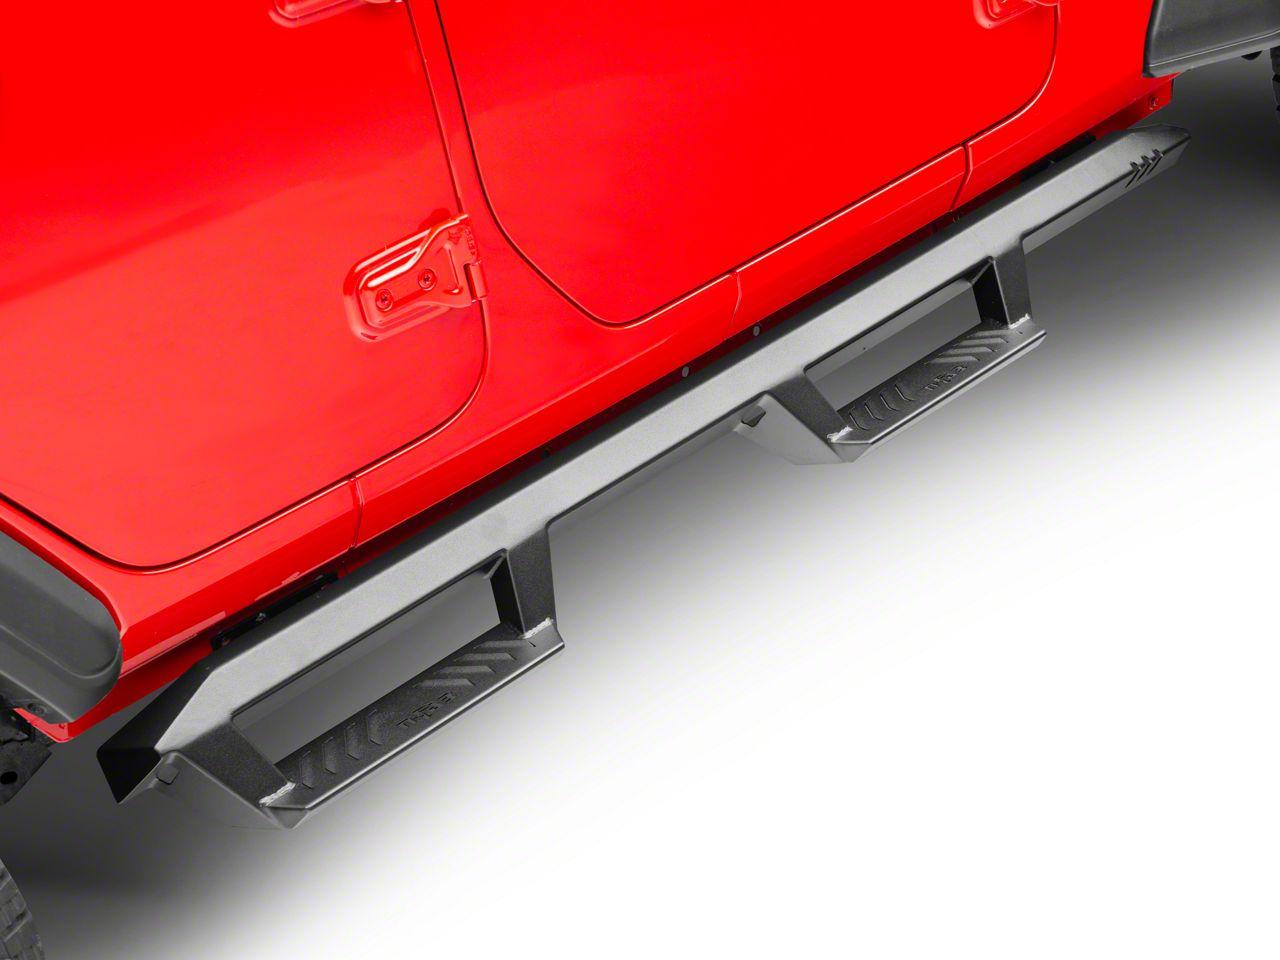 N-Fab EpYx Cab Length Nerf Side Step Bars - Textured Black (18-19 Jeep Wrangler JL 4 Door)